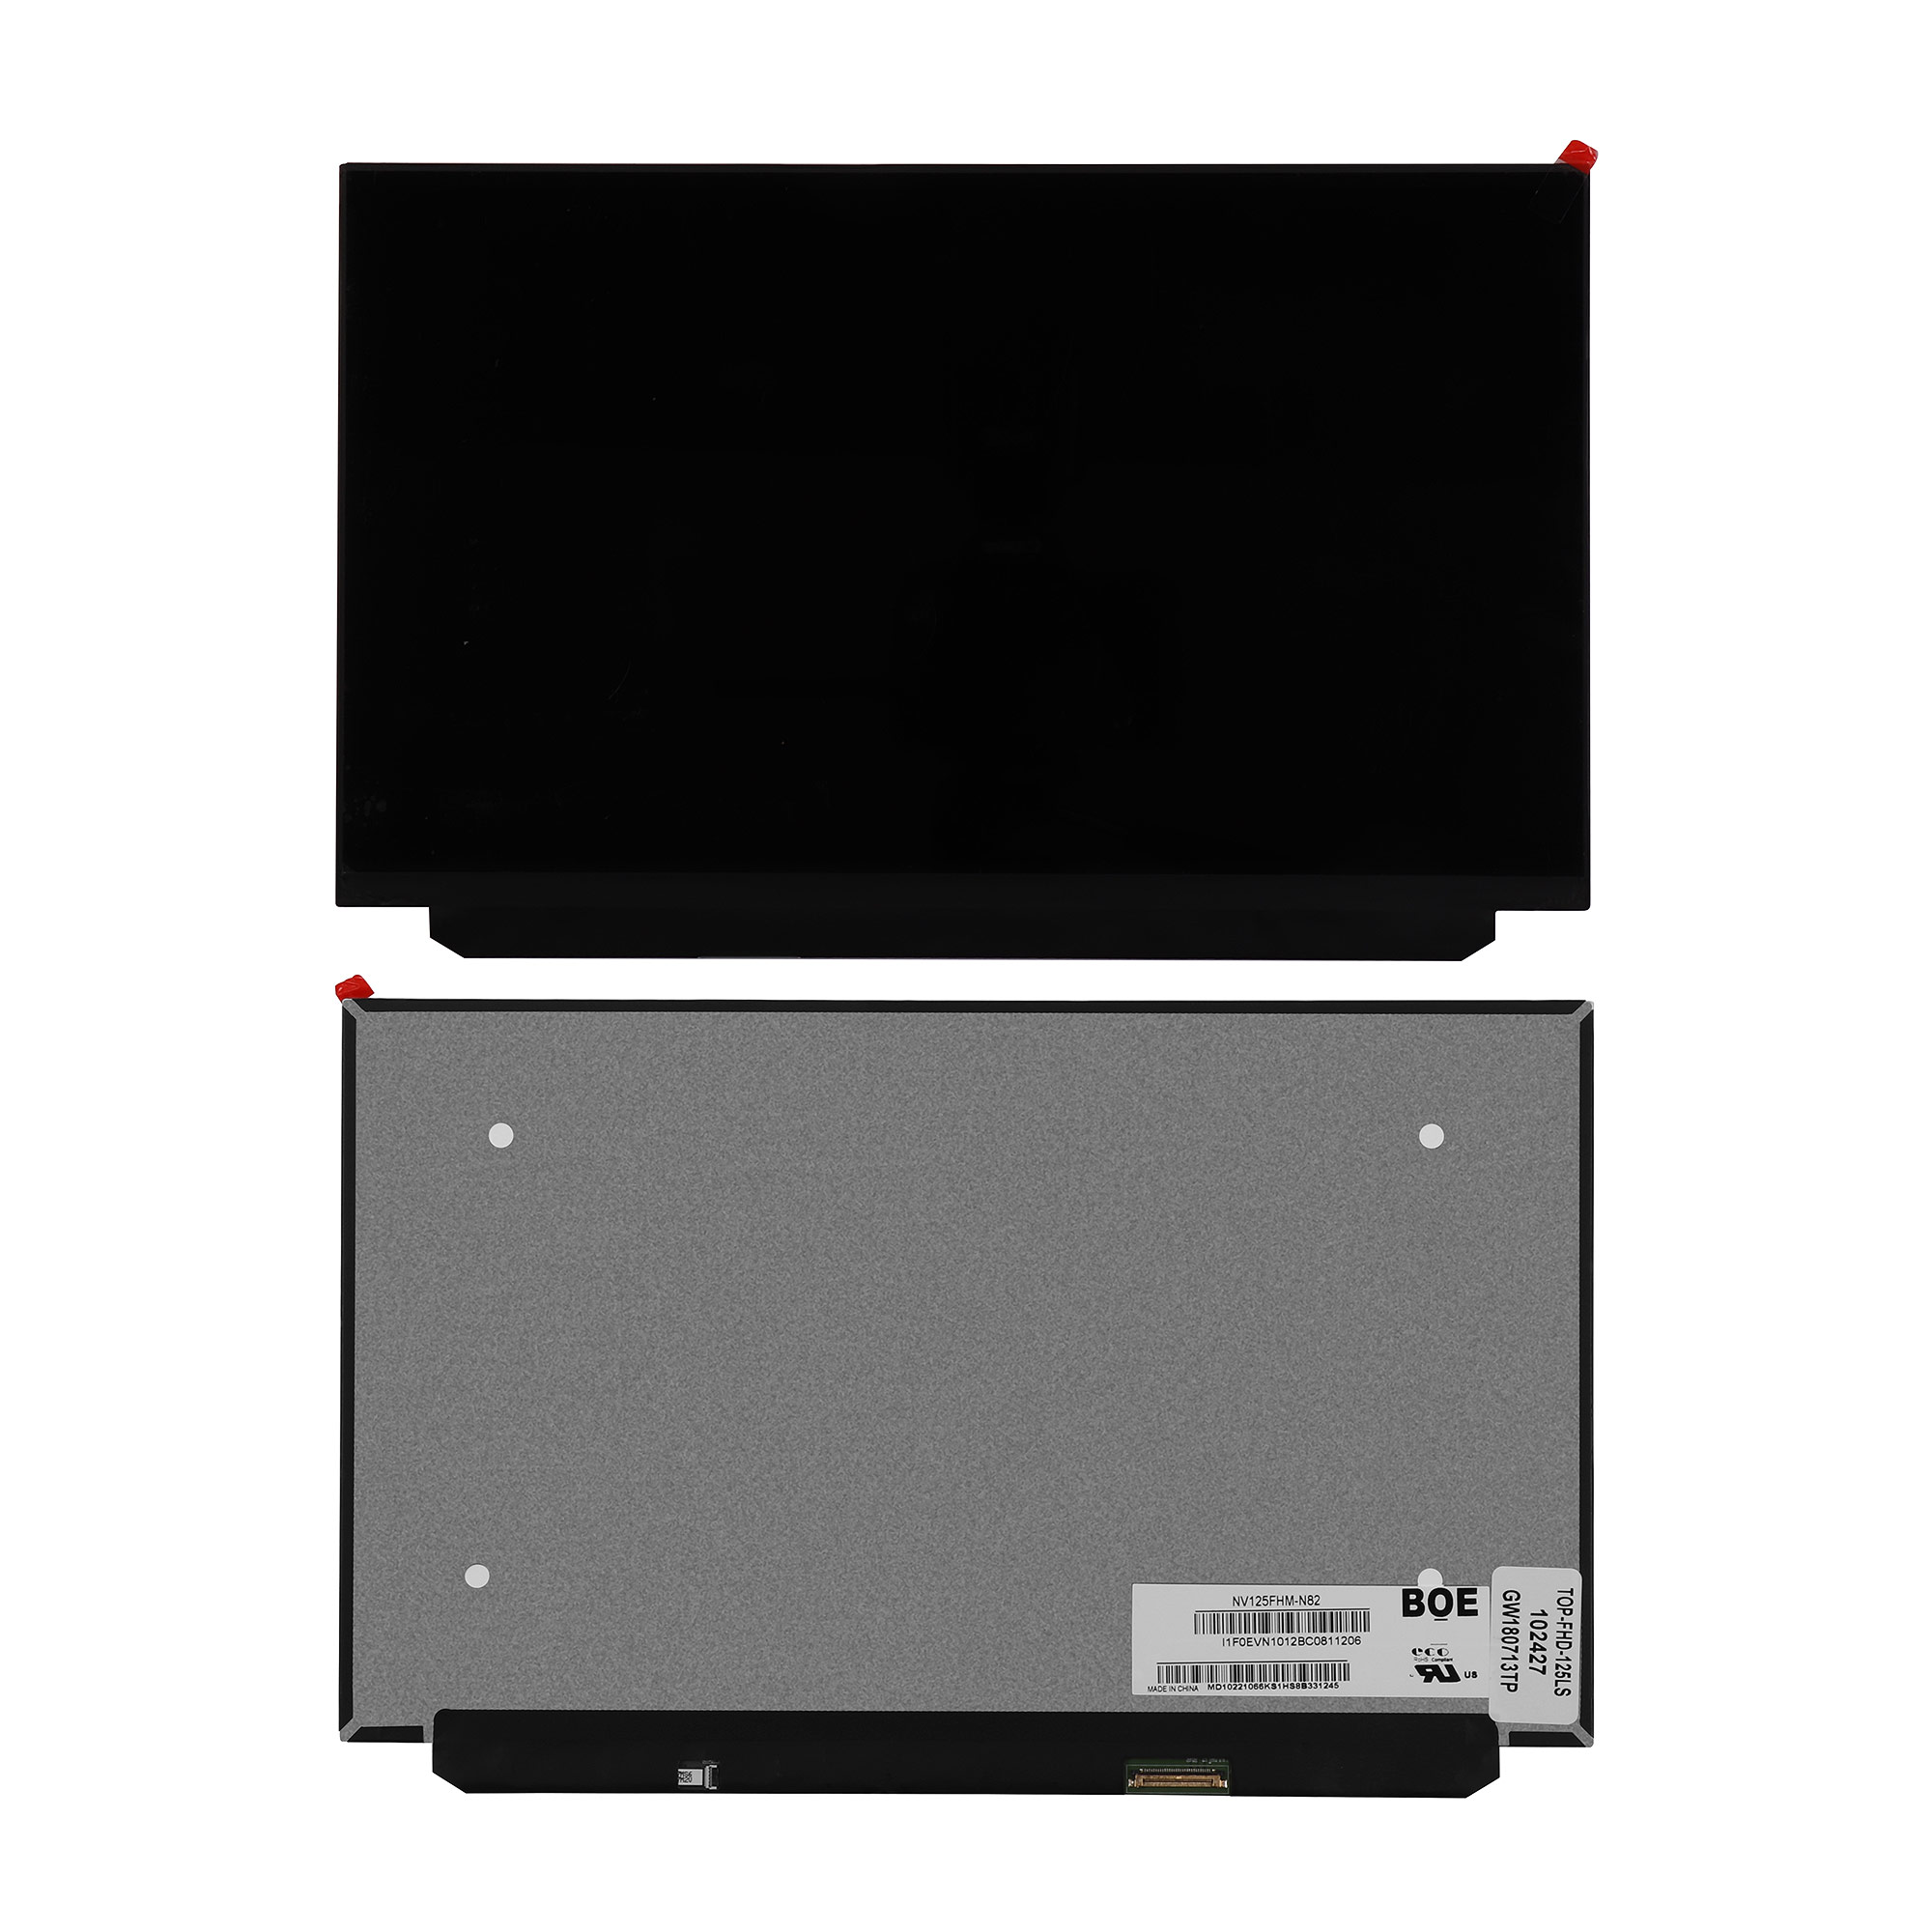 Запчасти для ремонта теле, видео, аудио 12.5 1920 x 1080 WUXGA FHD 30 pin LED Slim. Матовая. Замена: NV125FHM-N82.